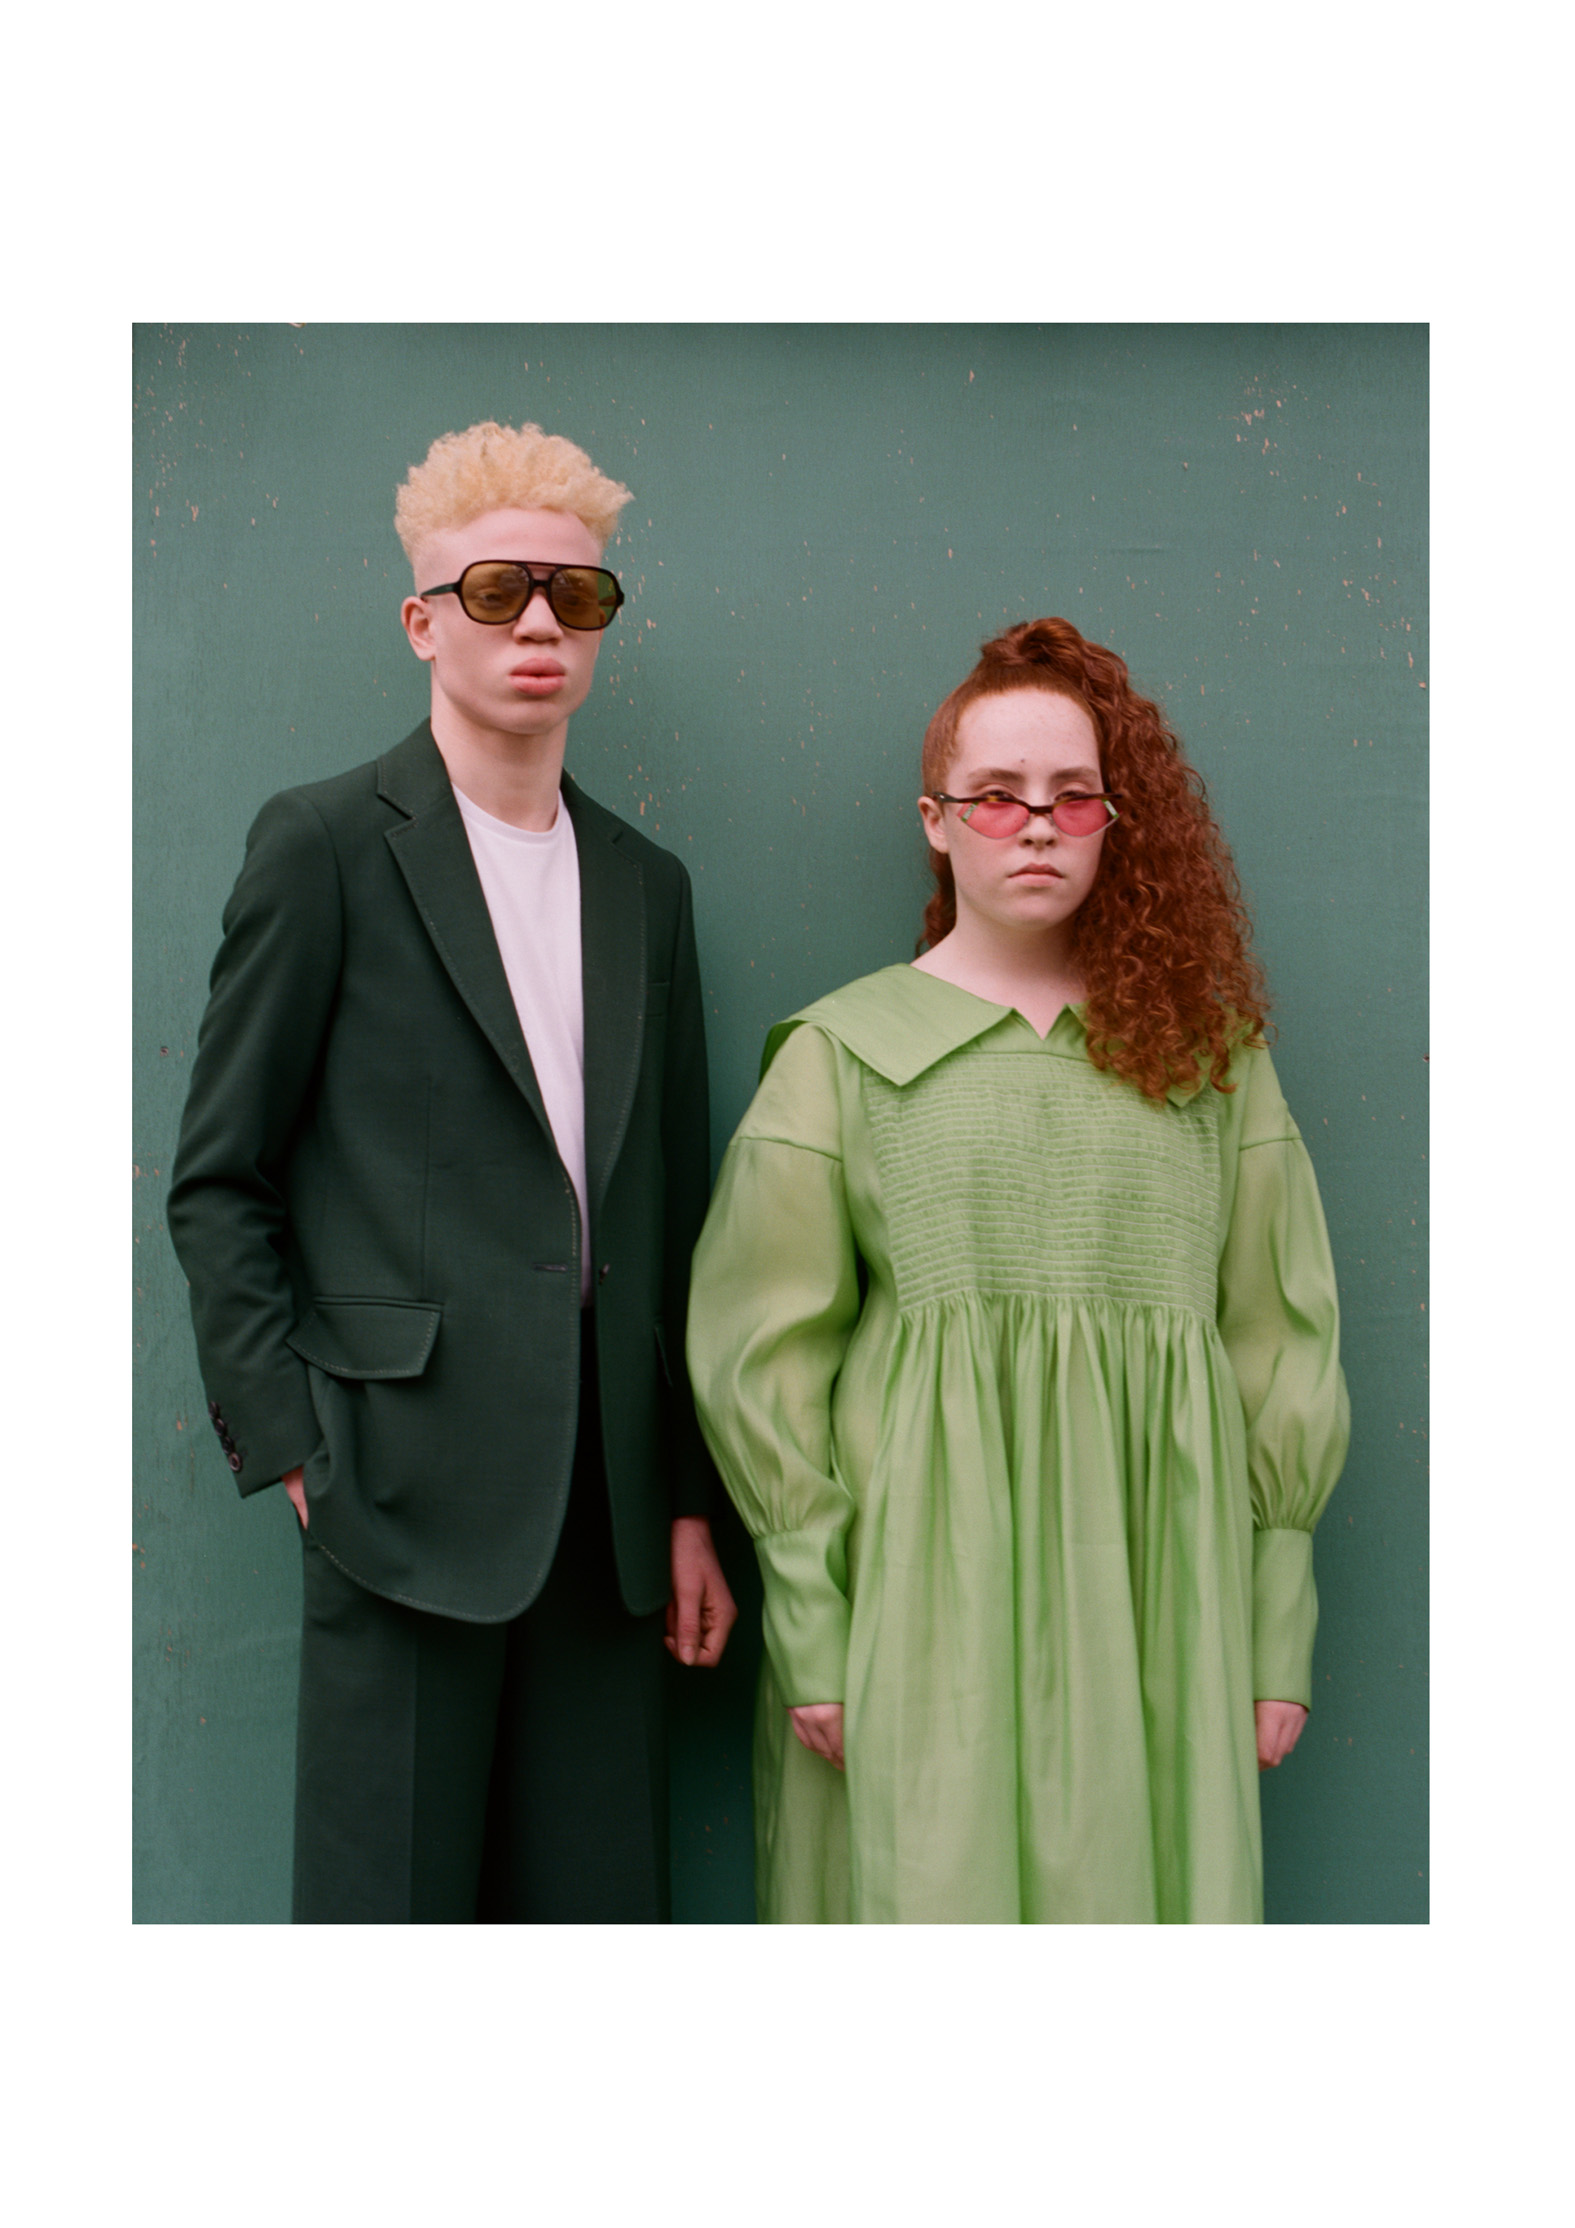 Shem, Ocular Albinism, Zebedee Managemen